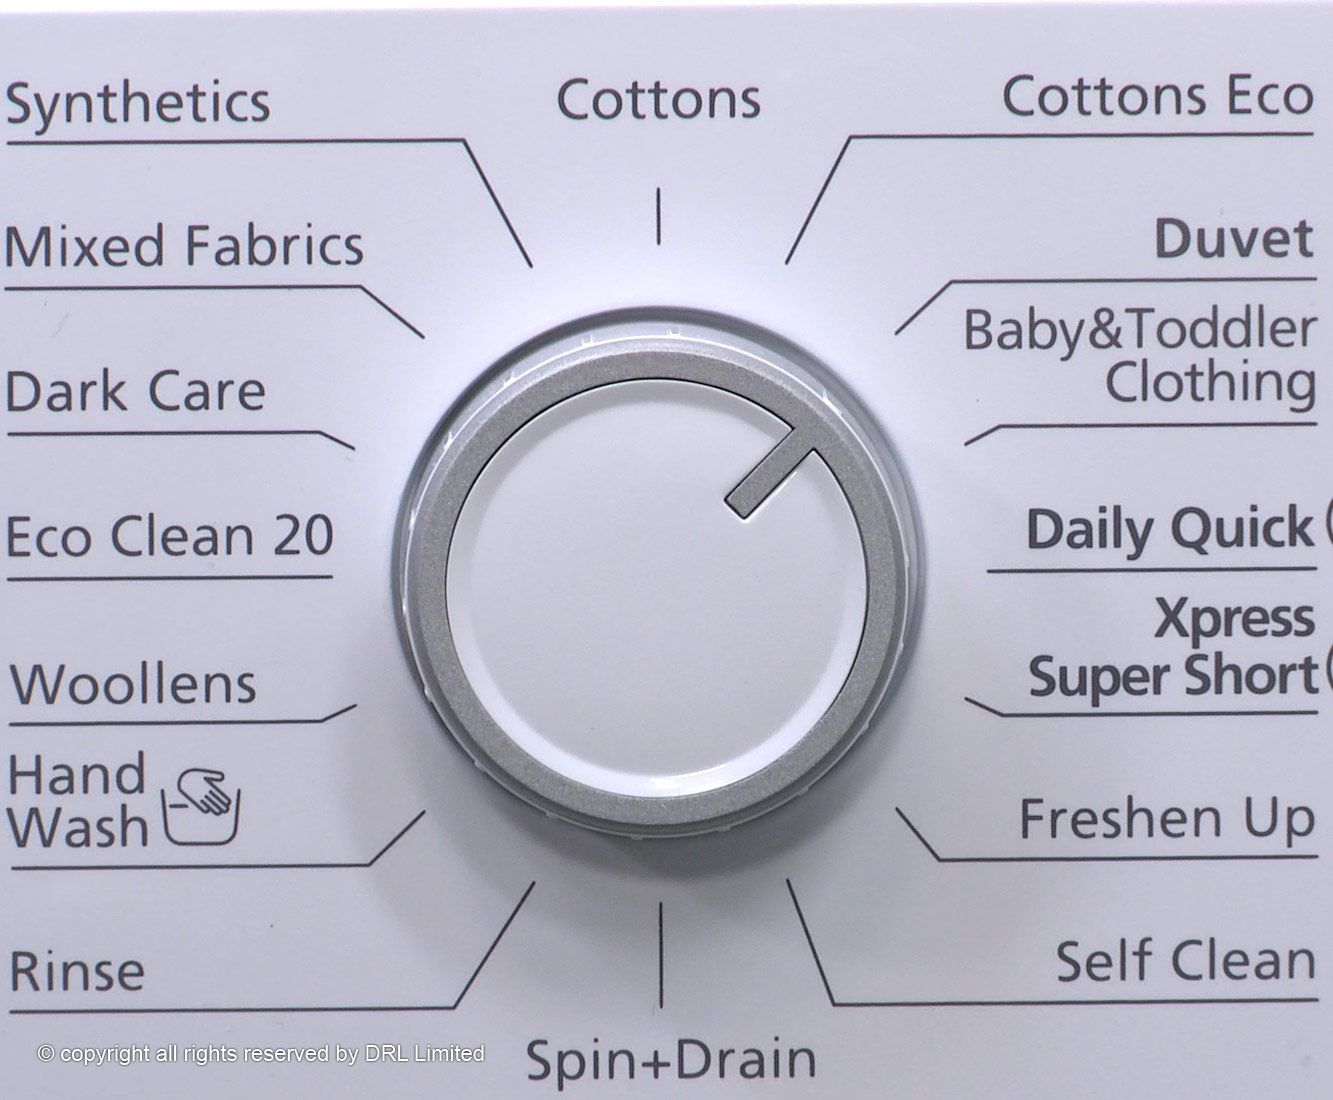 My Washing Machine Manual Beko Xl9 Mixing Fabrics Washing Machine Beko